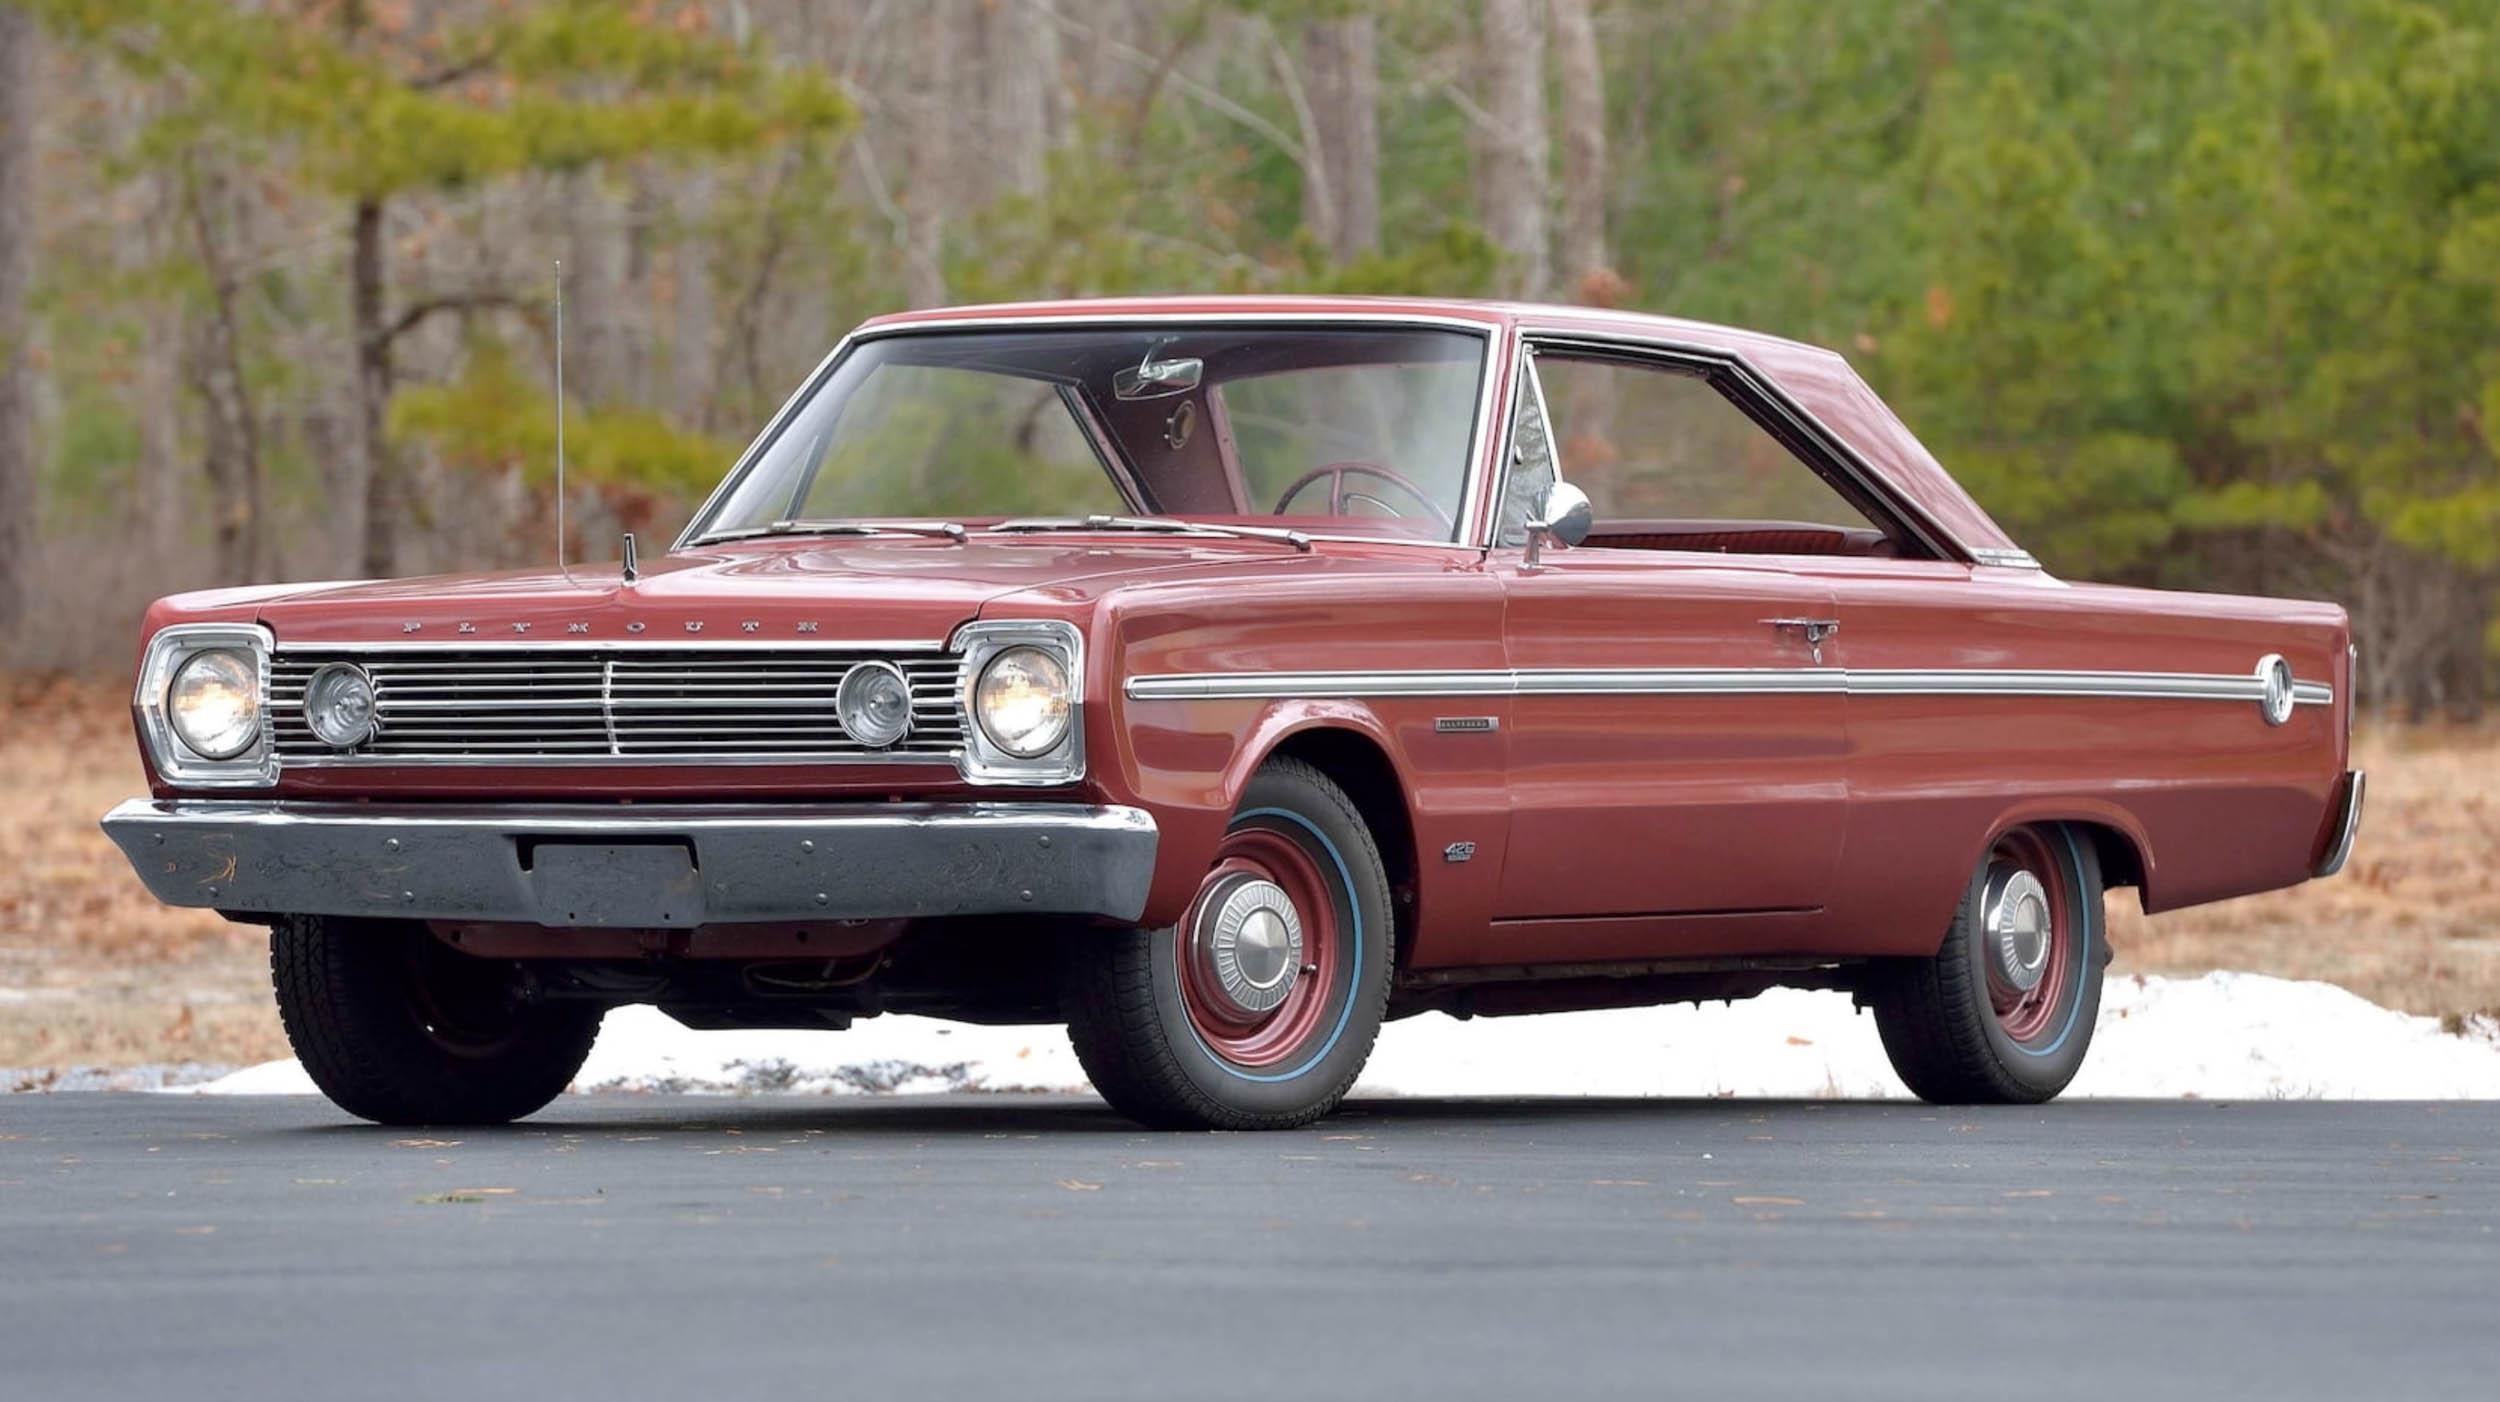 1966 Plymouth Belvedere Hardtop